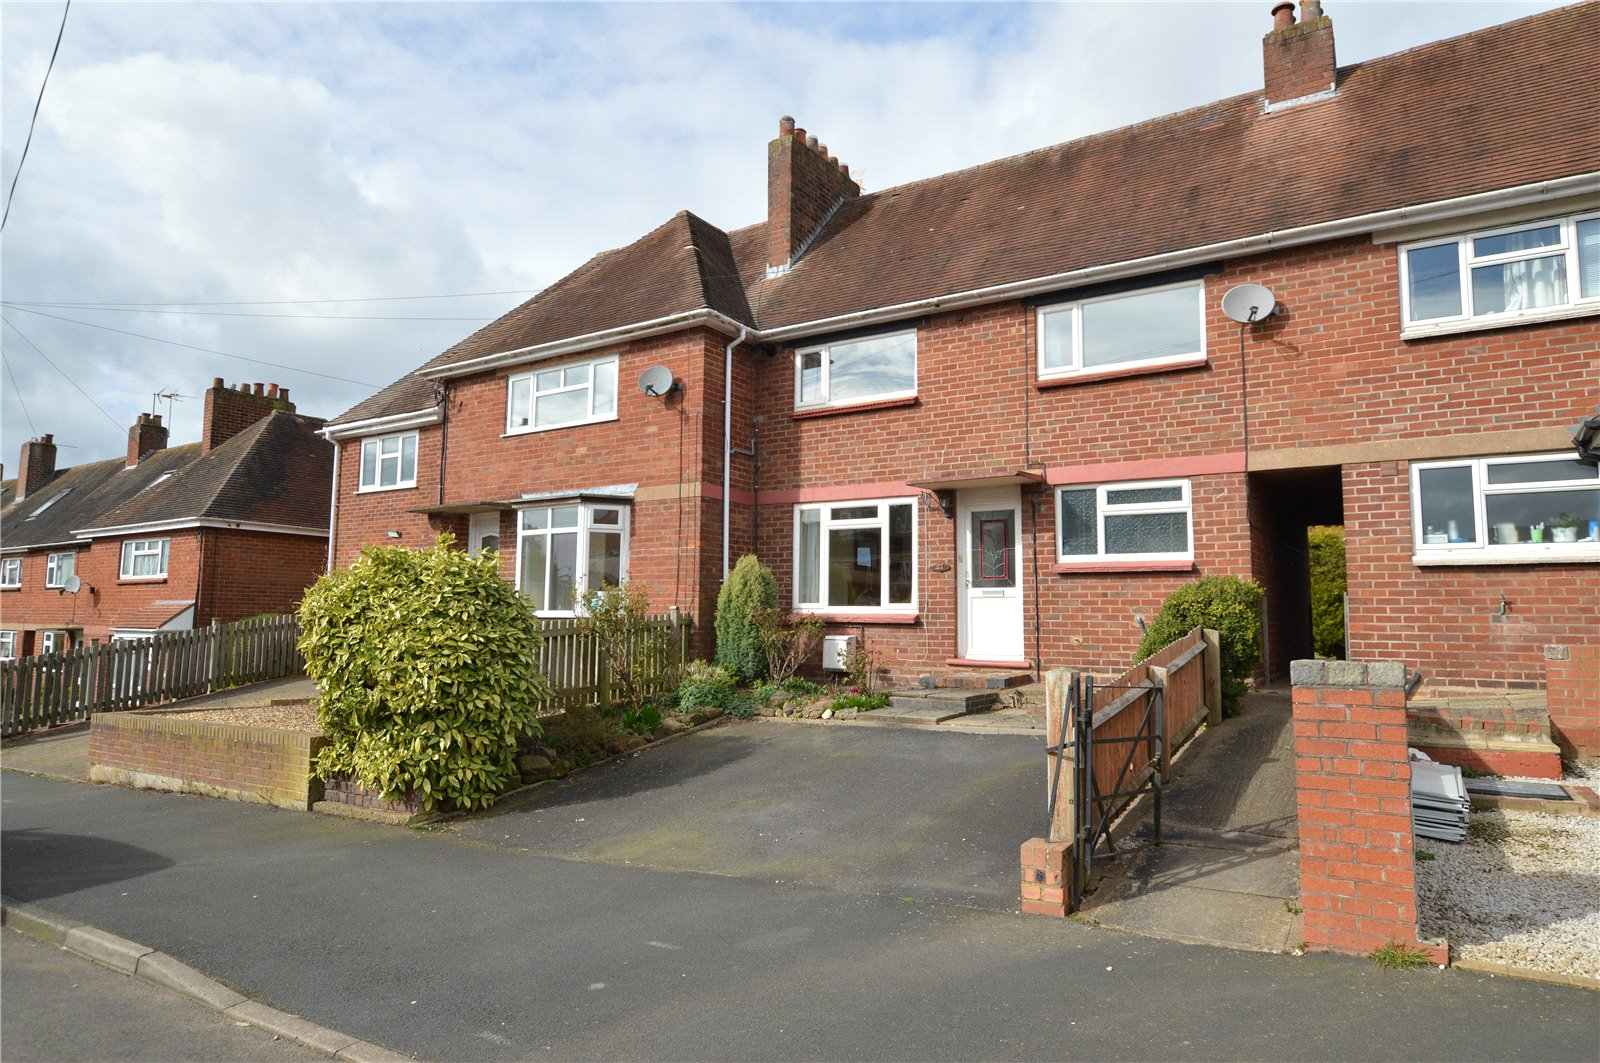 27 Beech Street, Highley, Bridgnorth, Shropshire, WV16